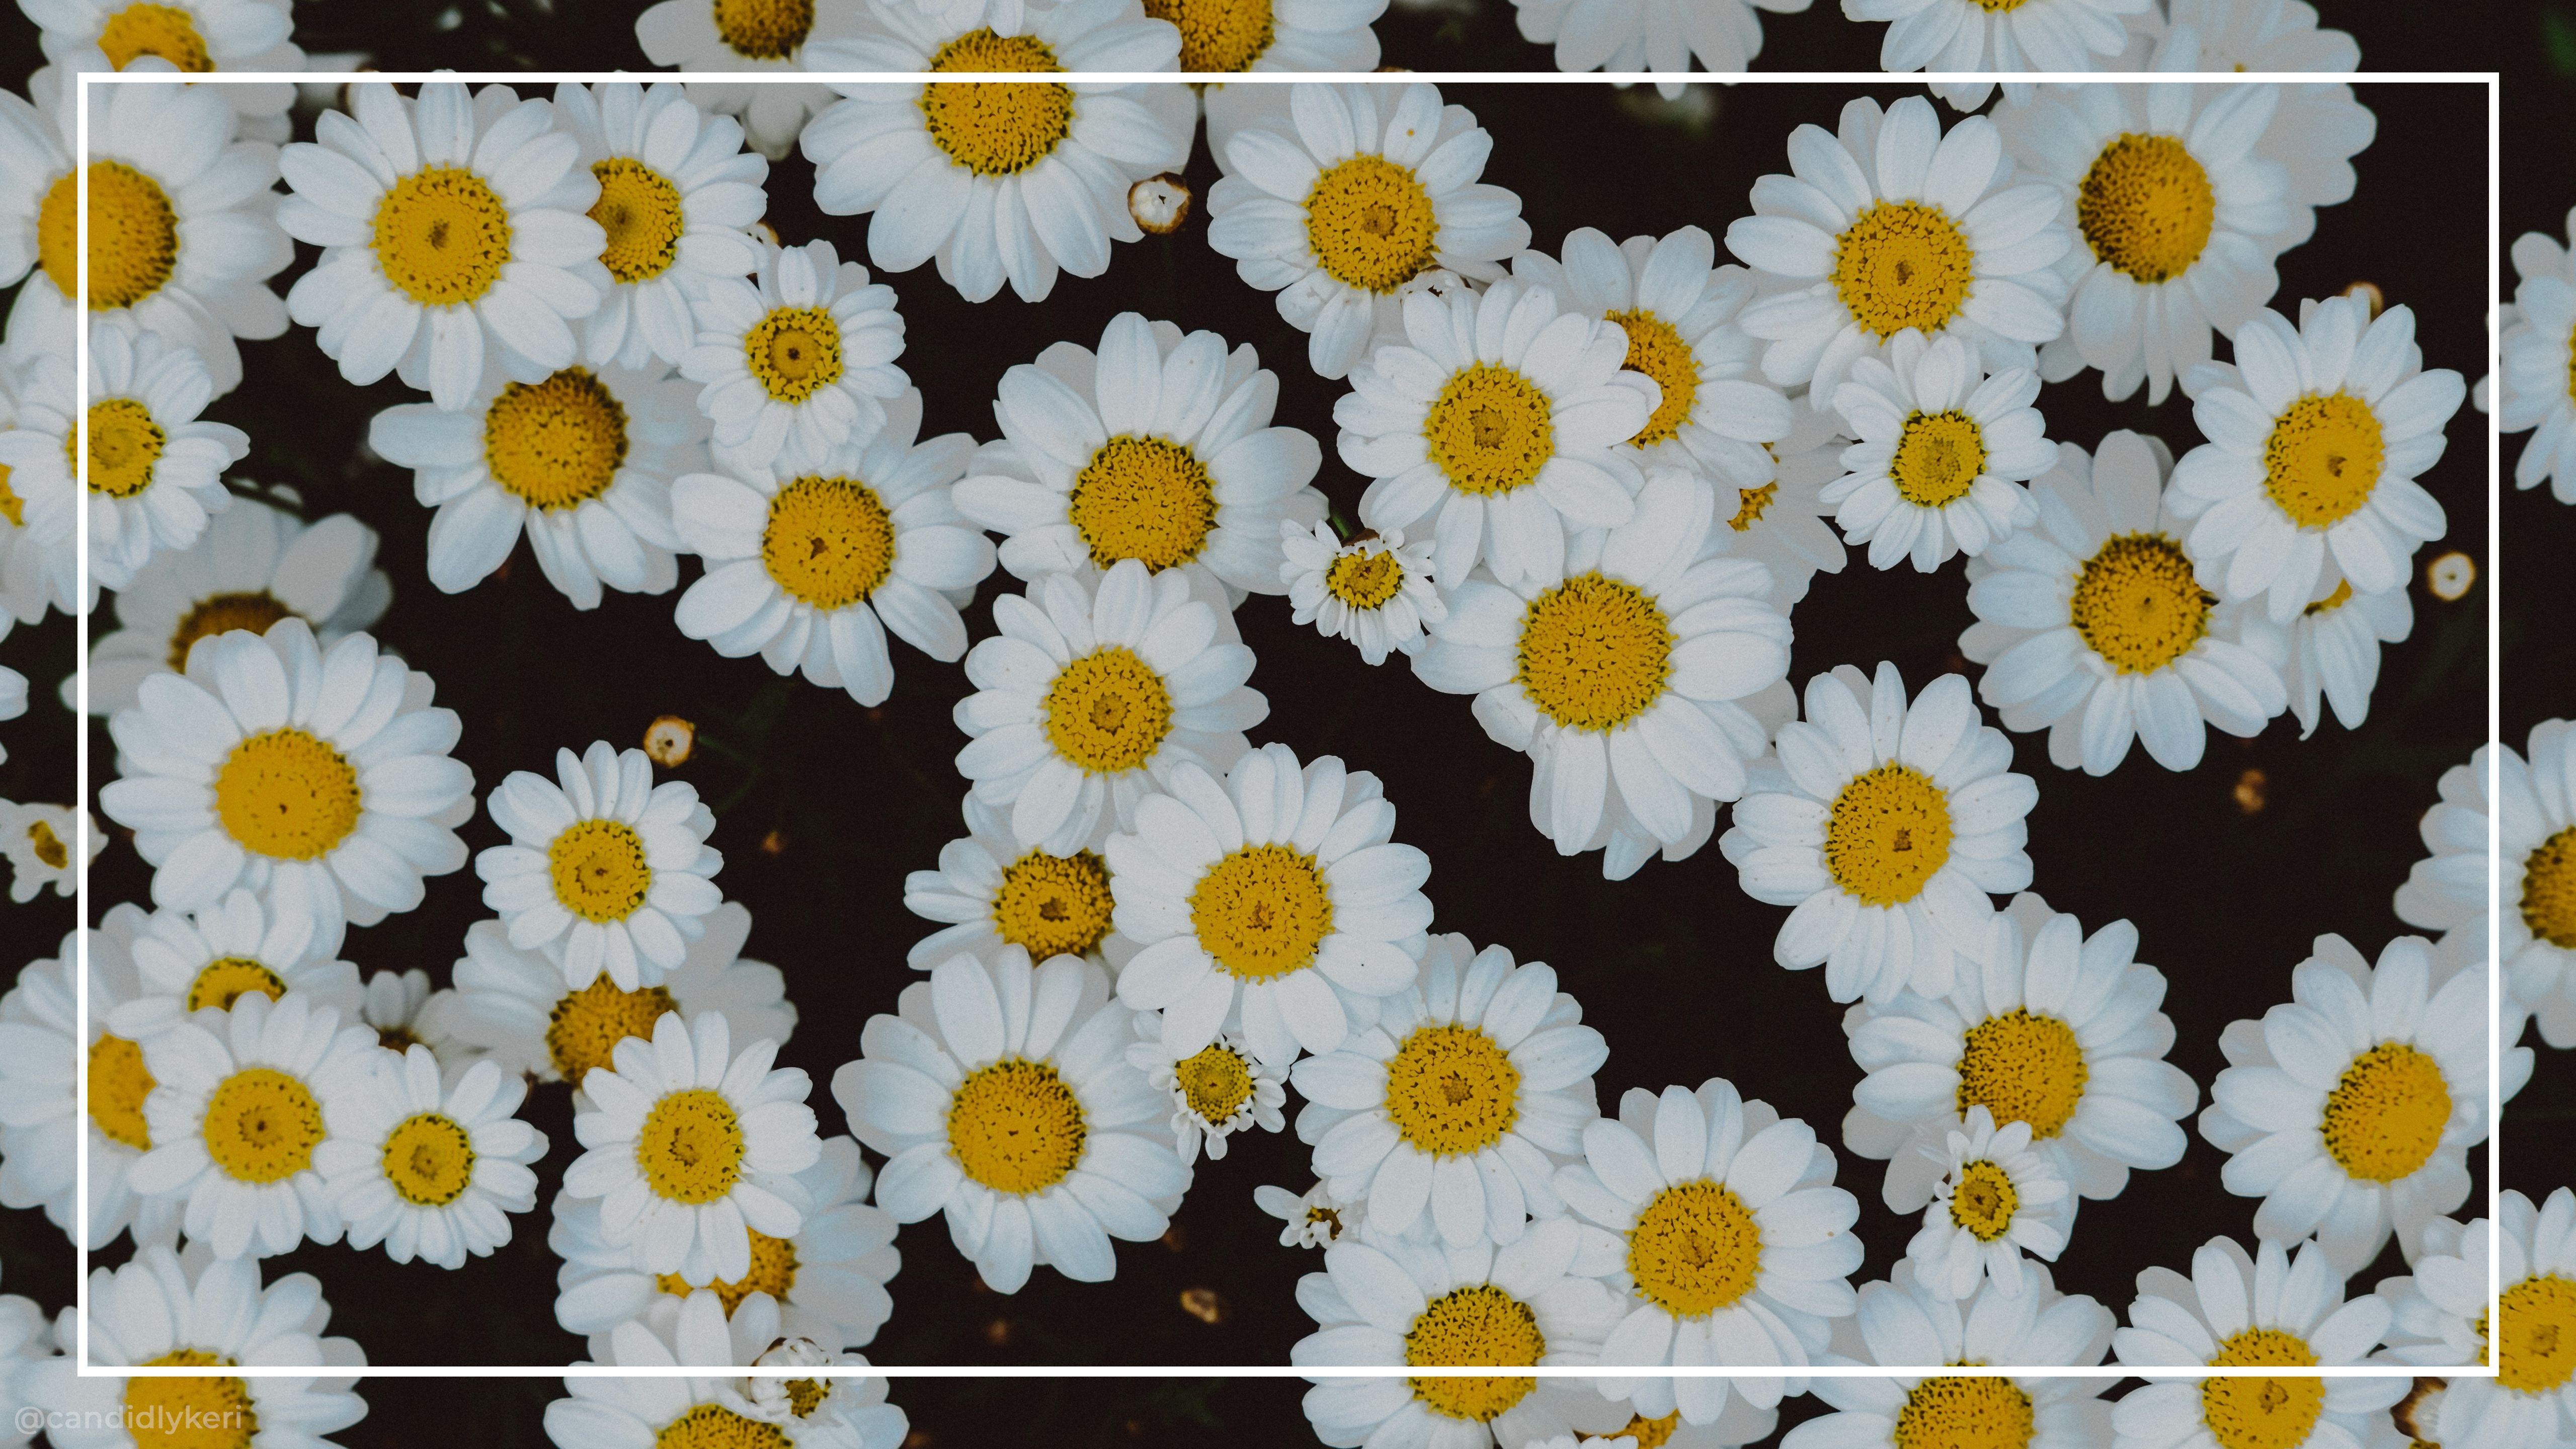 Aesthetic Flowers Laptop Wallpapers Top Free Aesthetic Flowers Laptop Backgrounds Wallpaperaccess